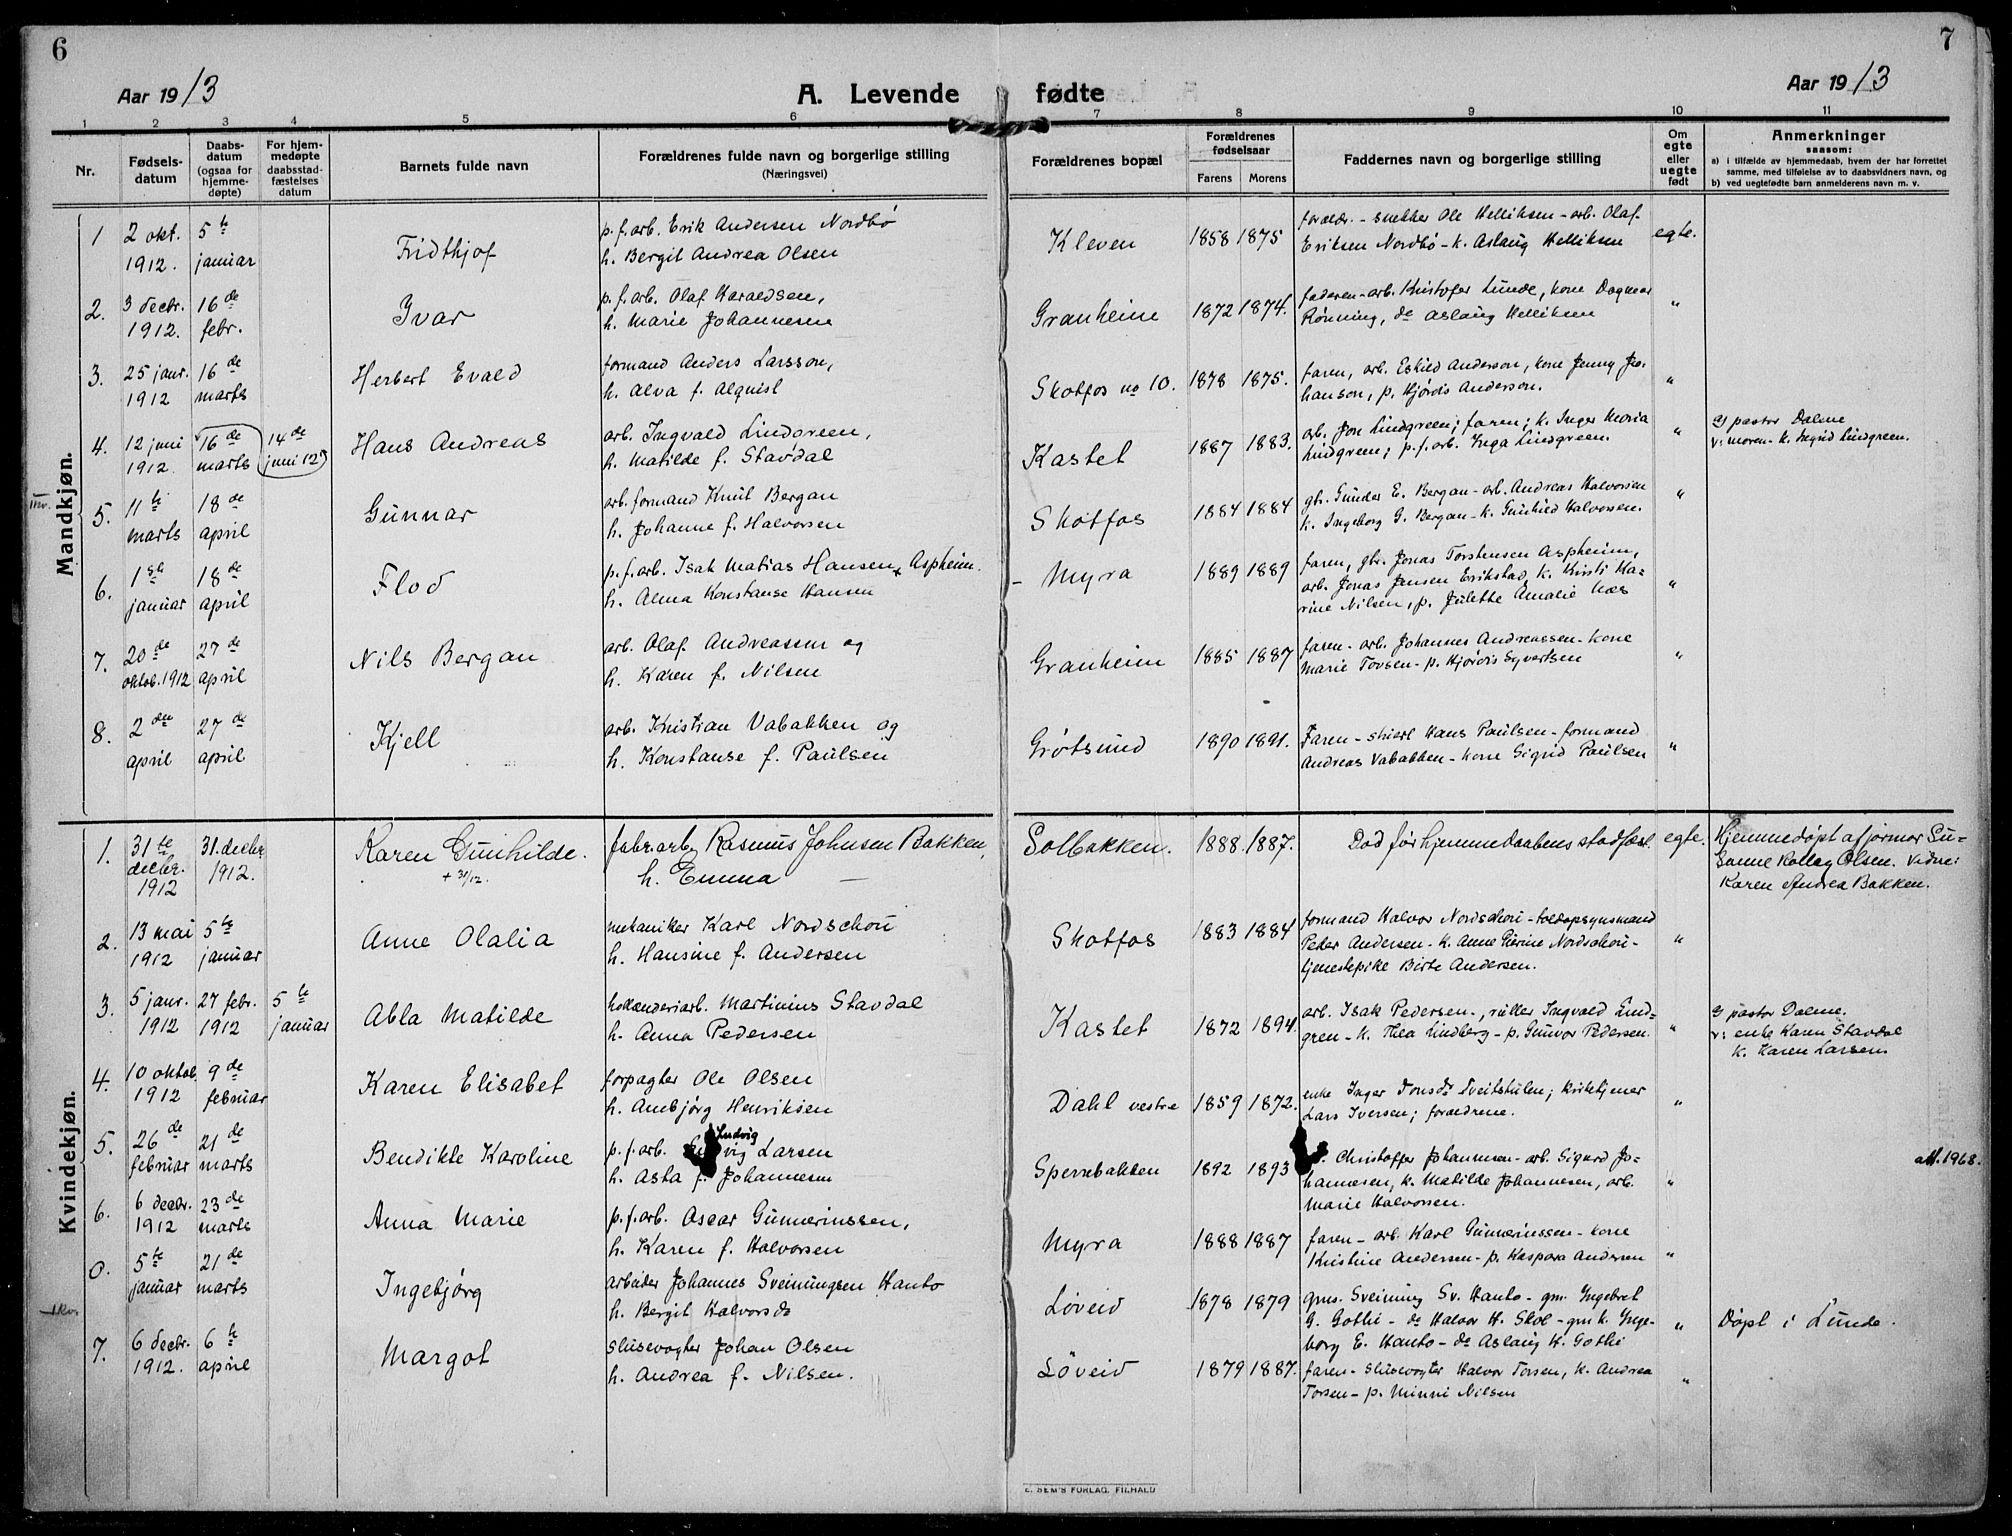 SAKO, Solum kirkebøker, F/Fb/L0004: Ministerialbok nr. II 4, 1913-1924, s. 6-7